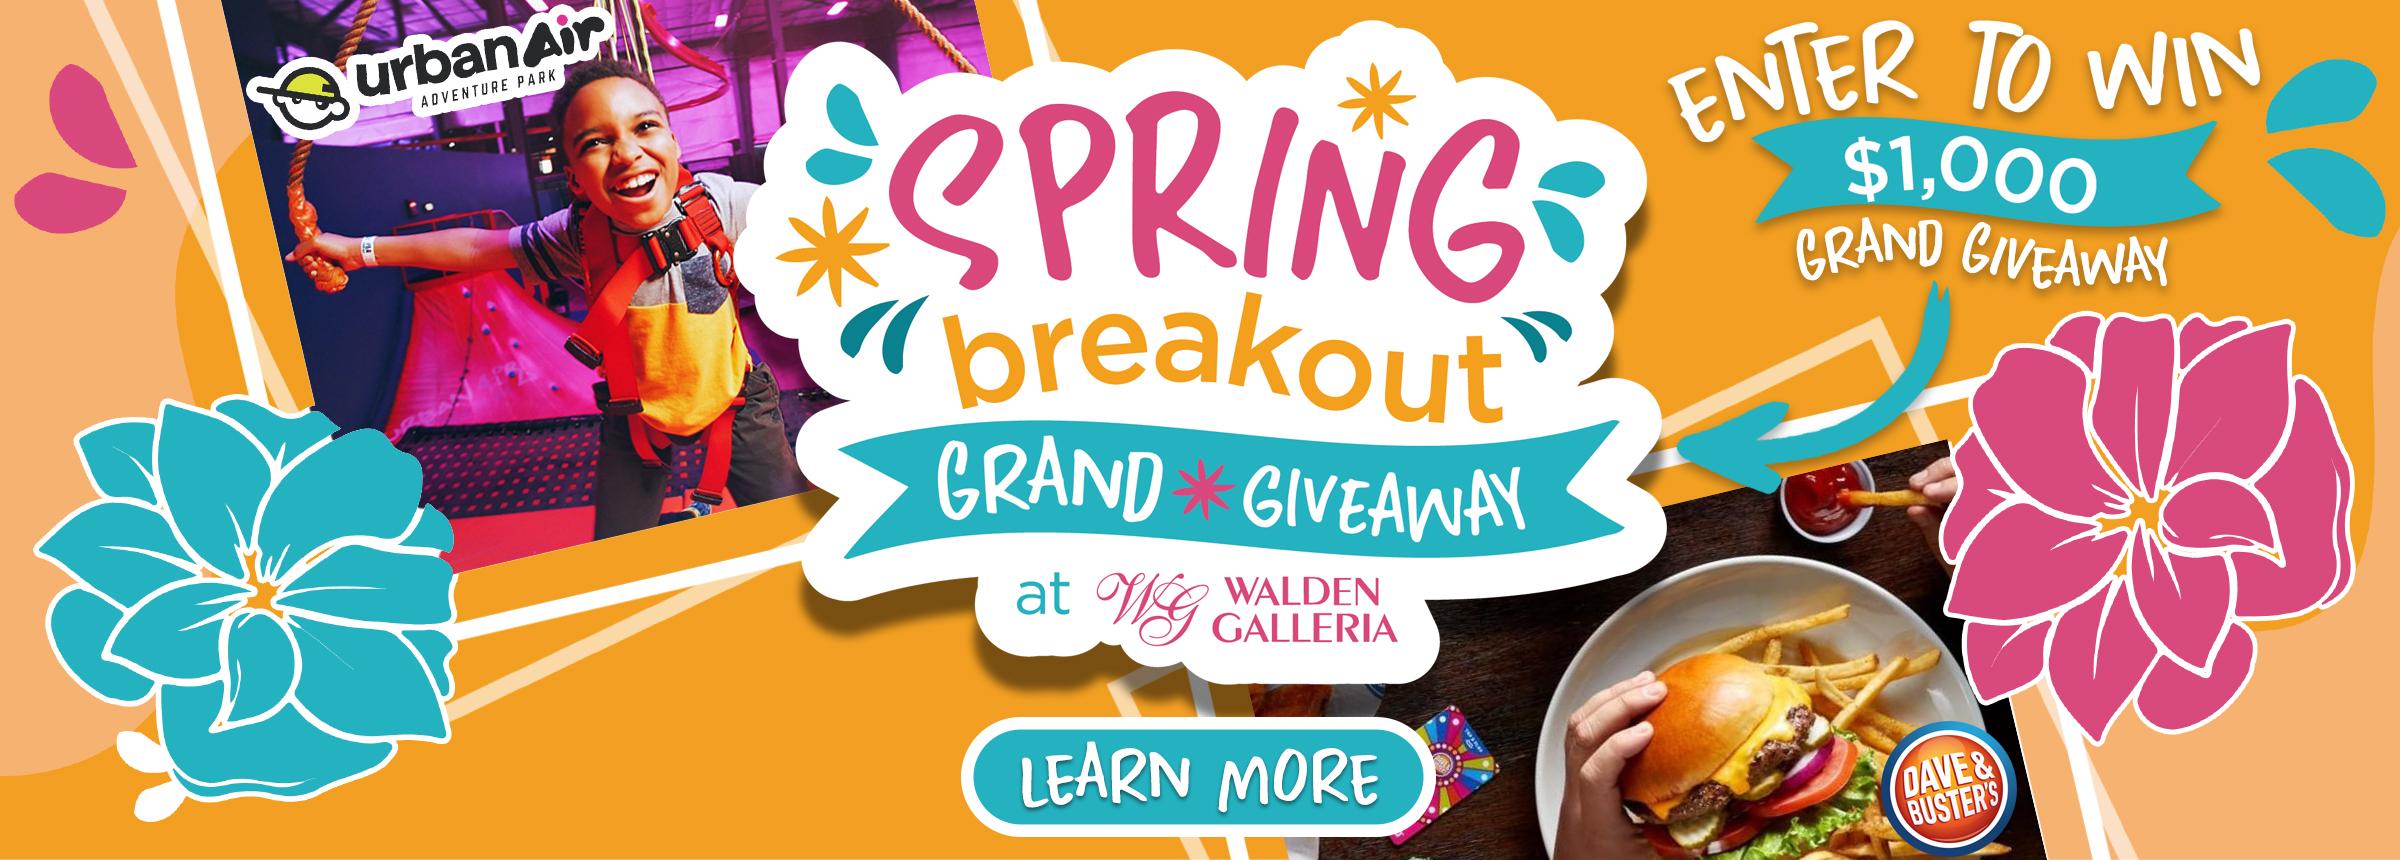 Spring Breakout Hero Image